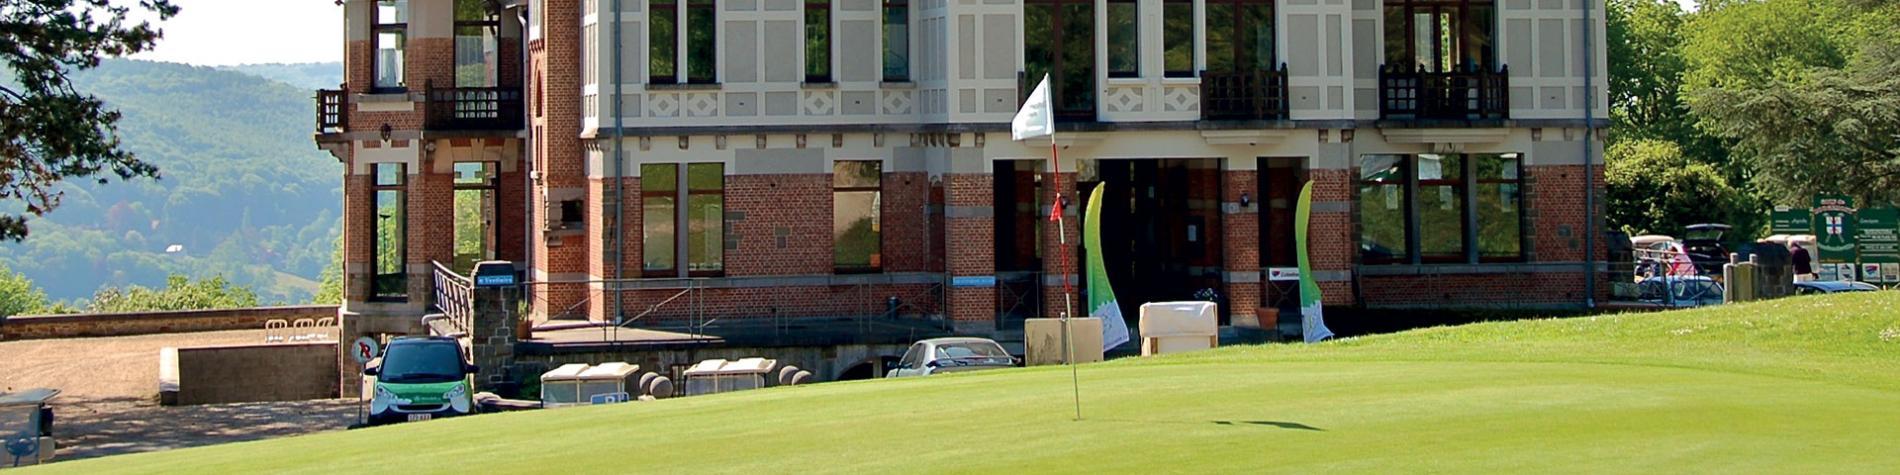 Club house - Golf - Rougemont